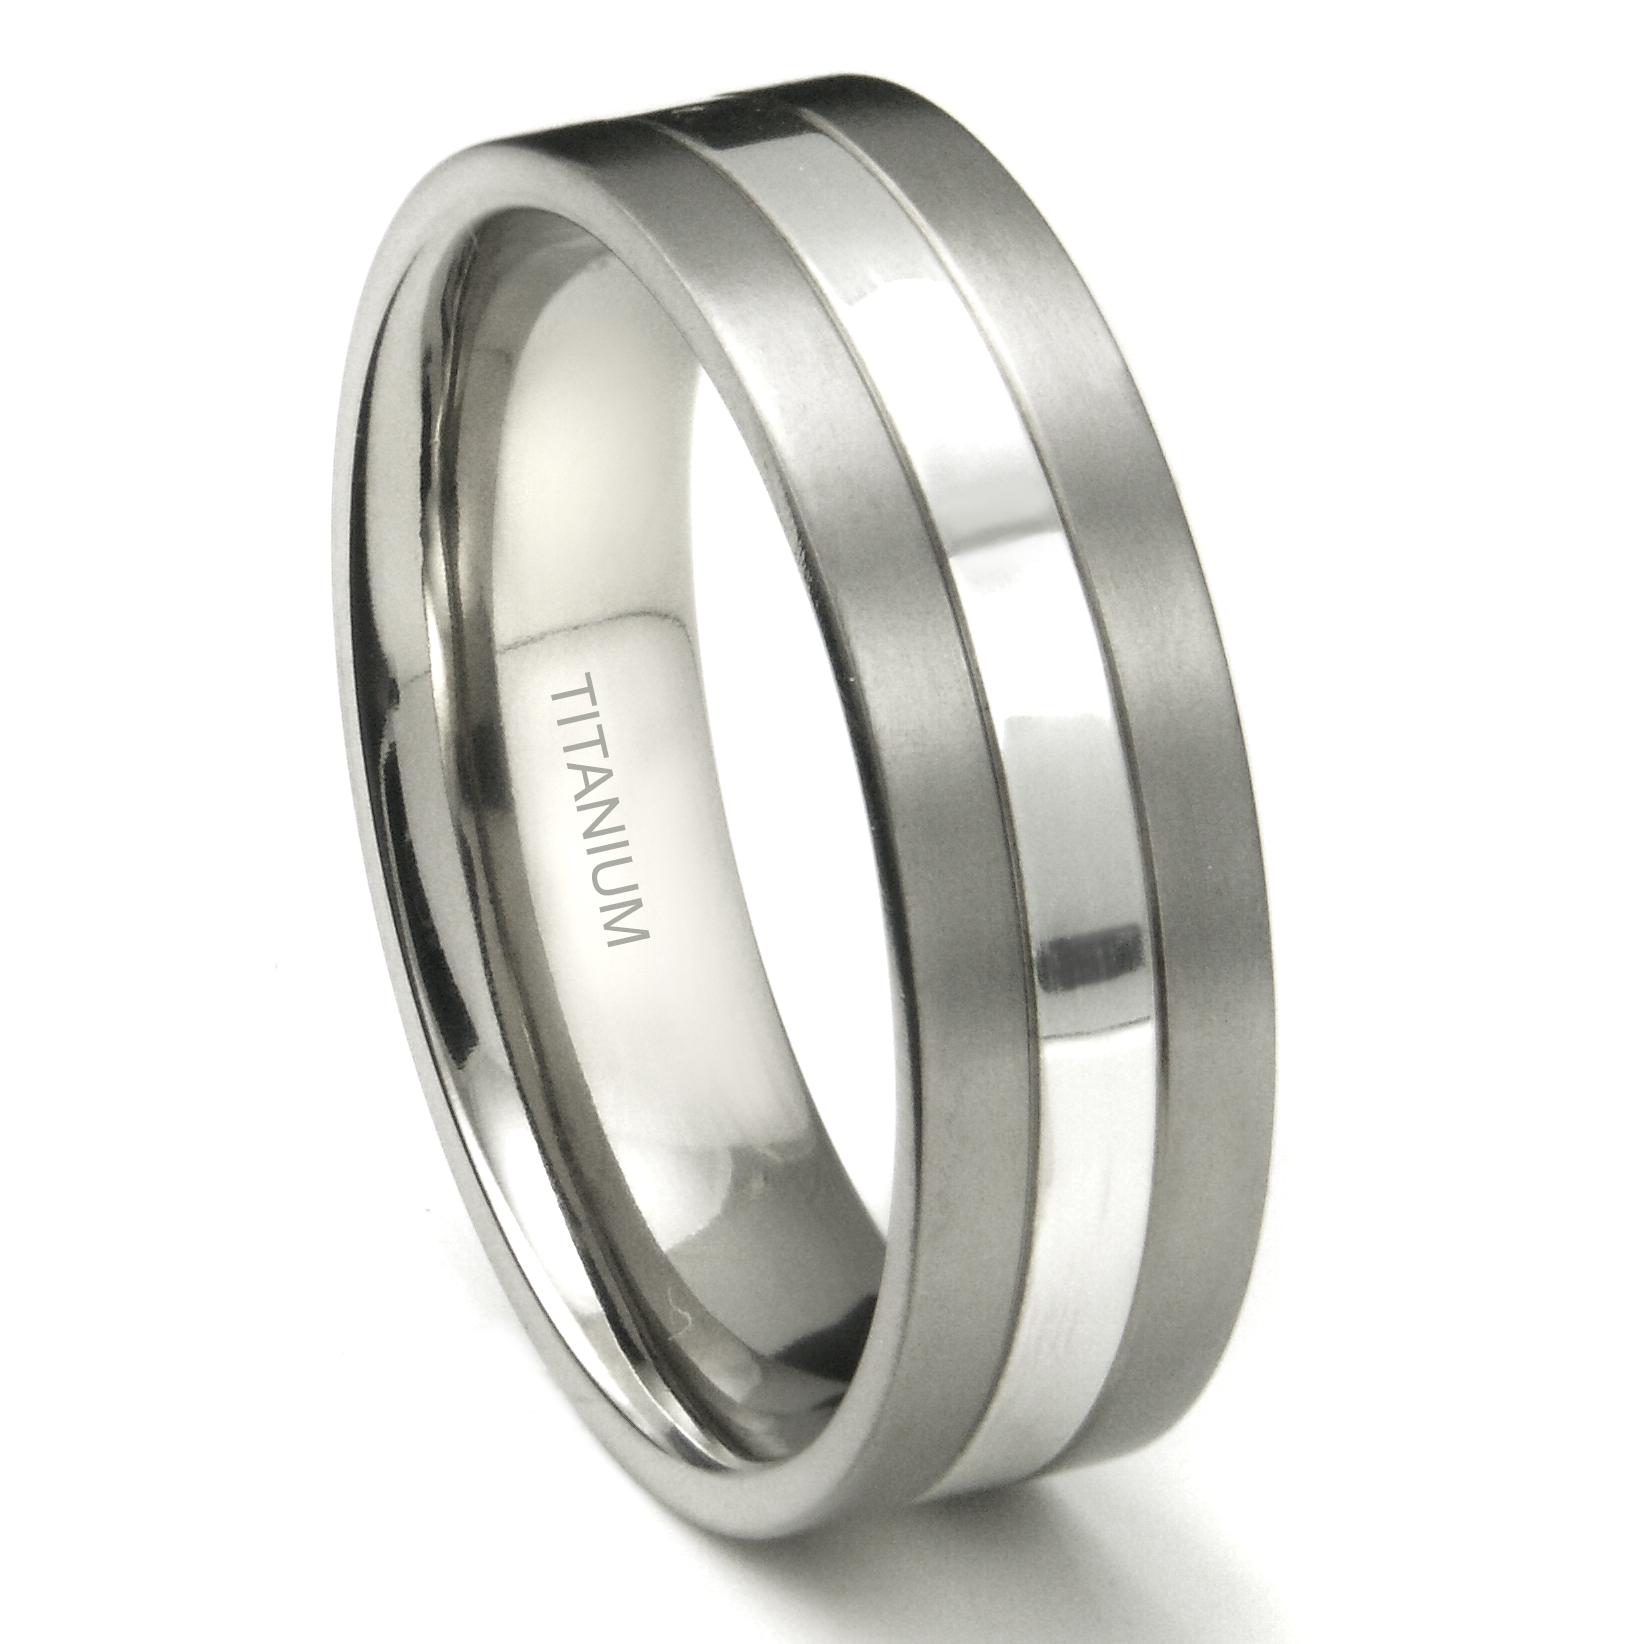 Titanium 7mm Two Tone Wedding Ring P mens titanium wedding rings Home Men s Titanium Wedding Rings Loading zoom